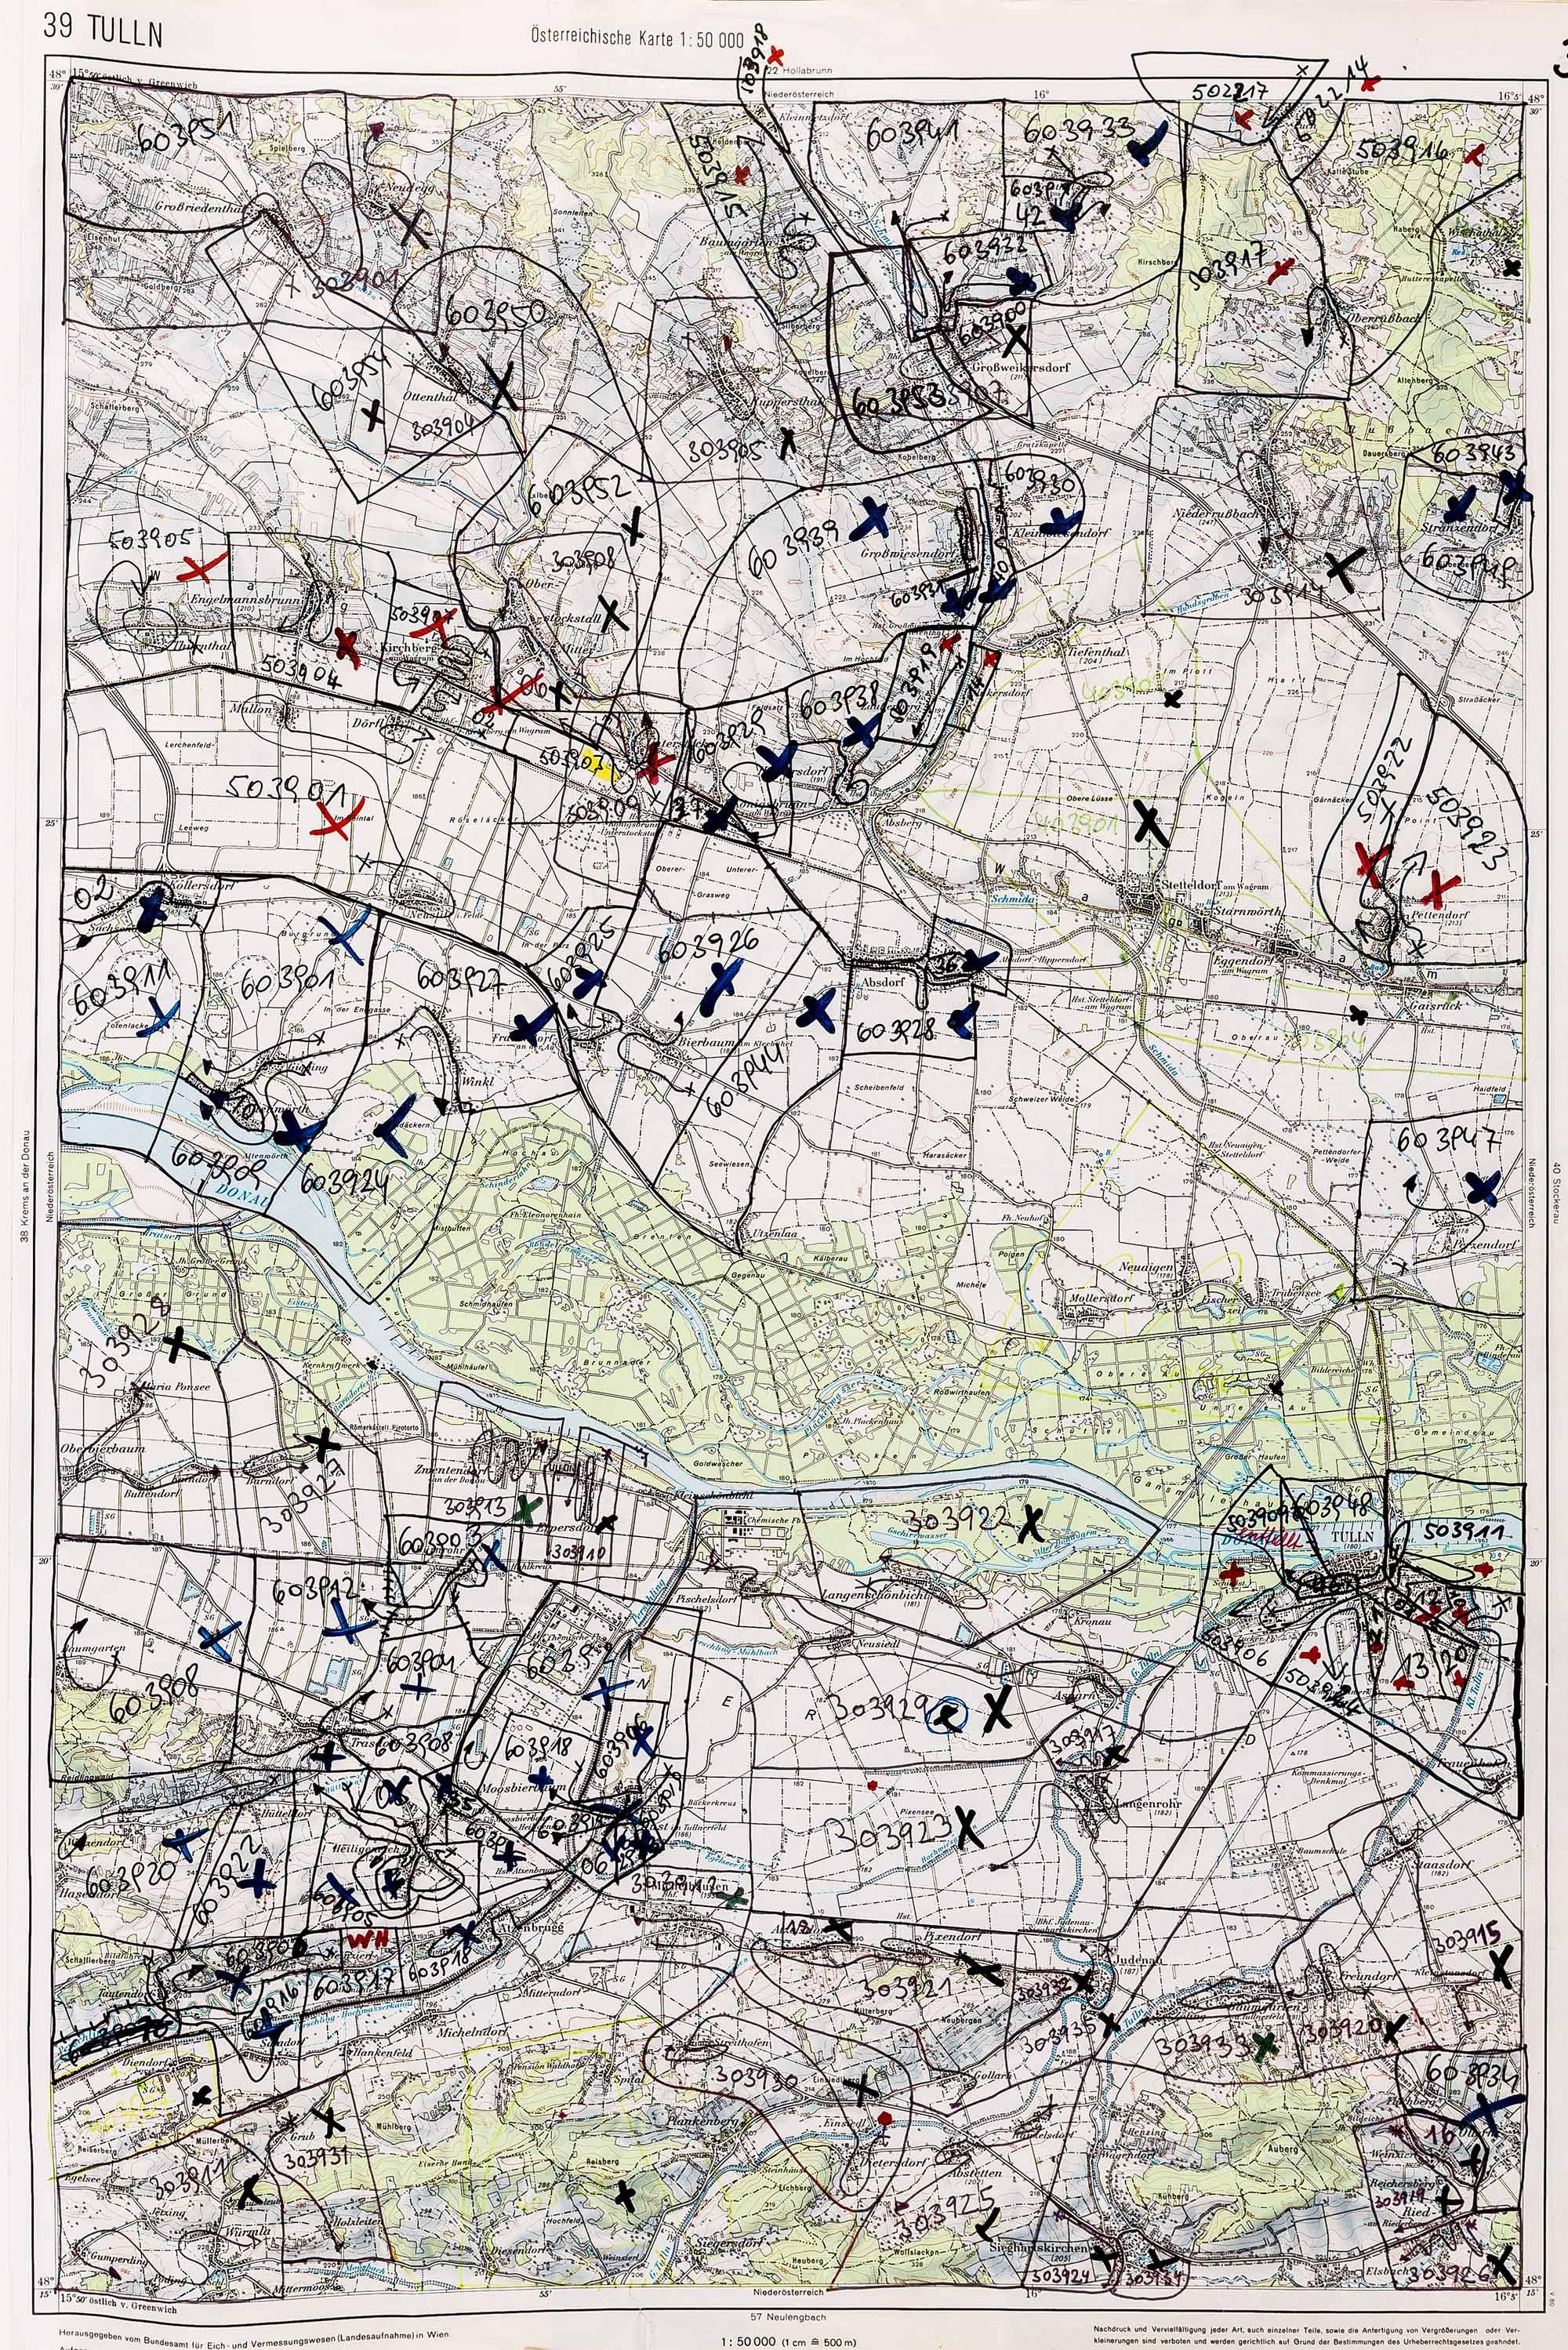 1983-1986 Karte 039